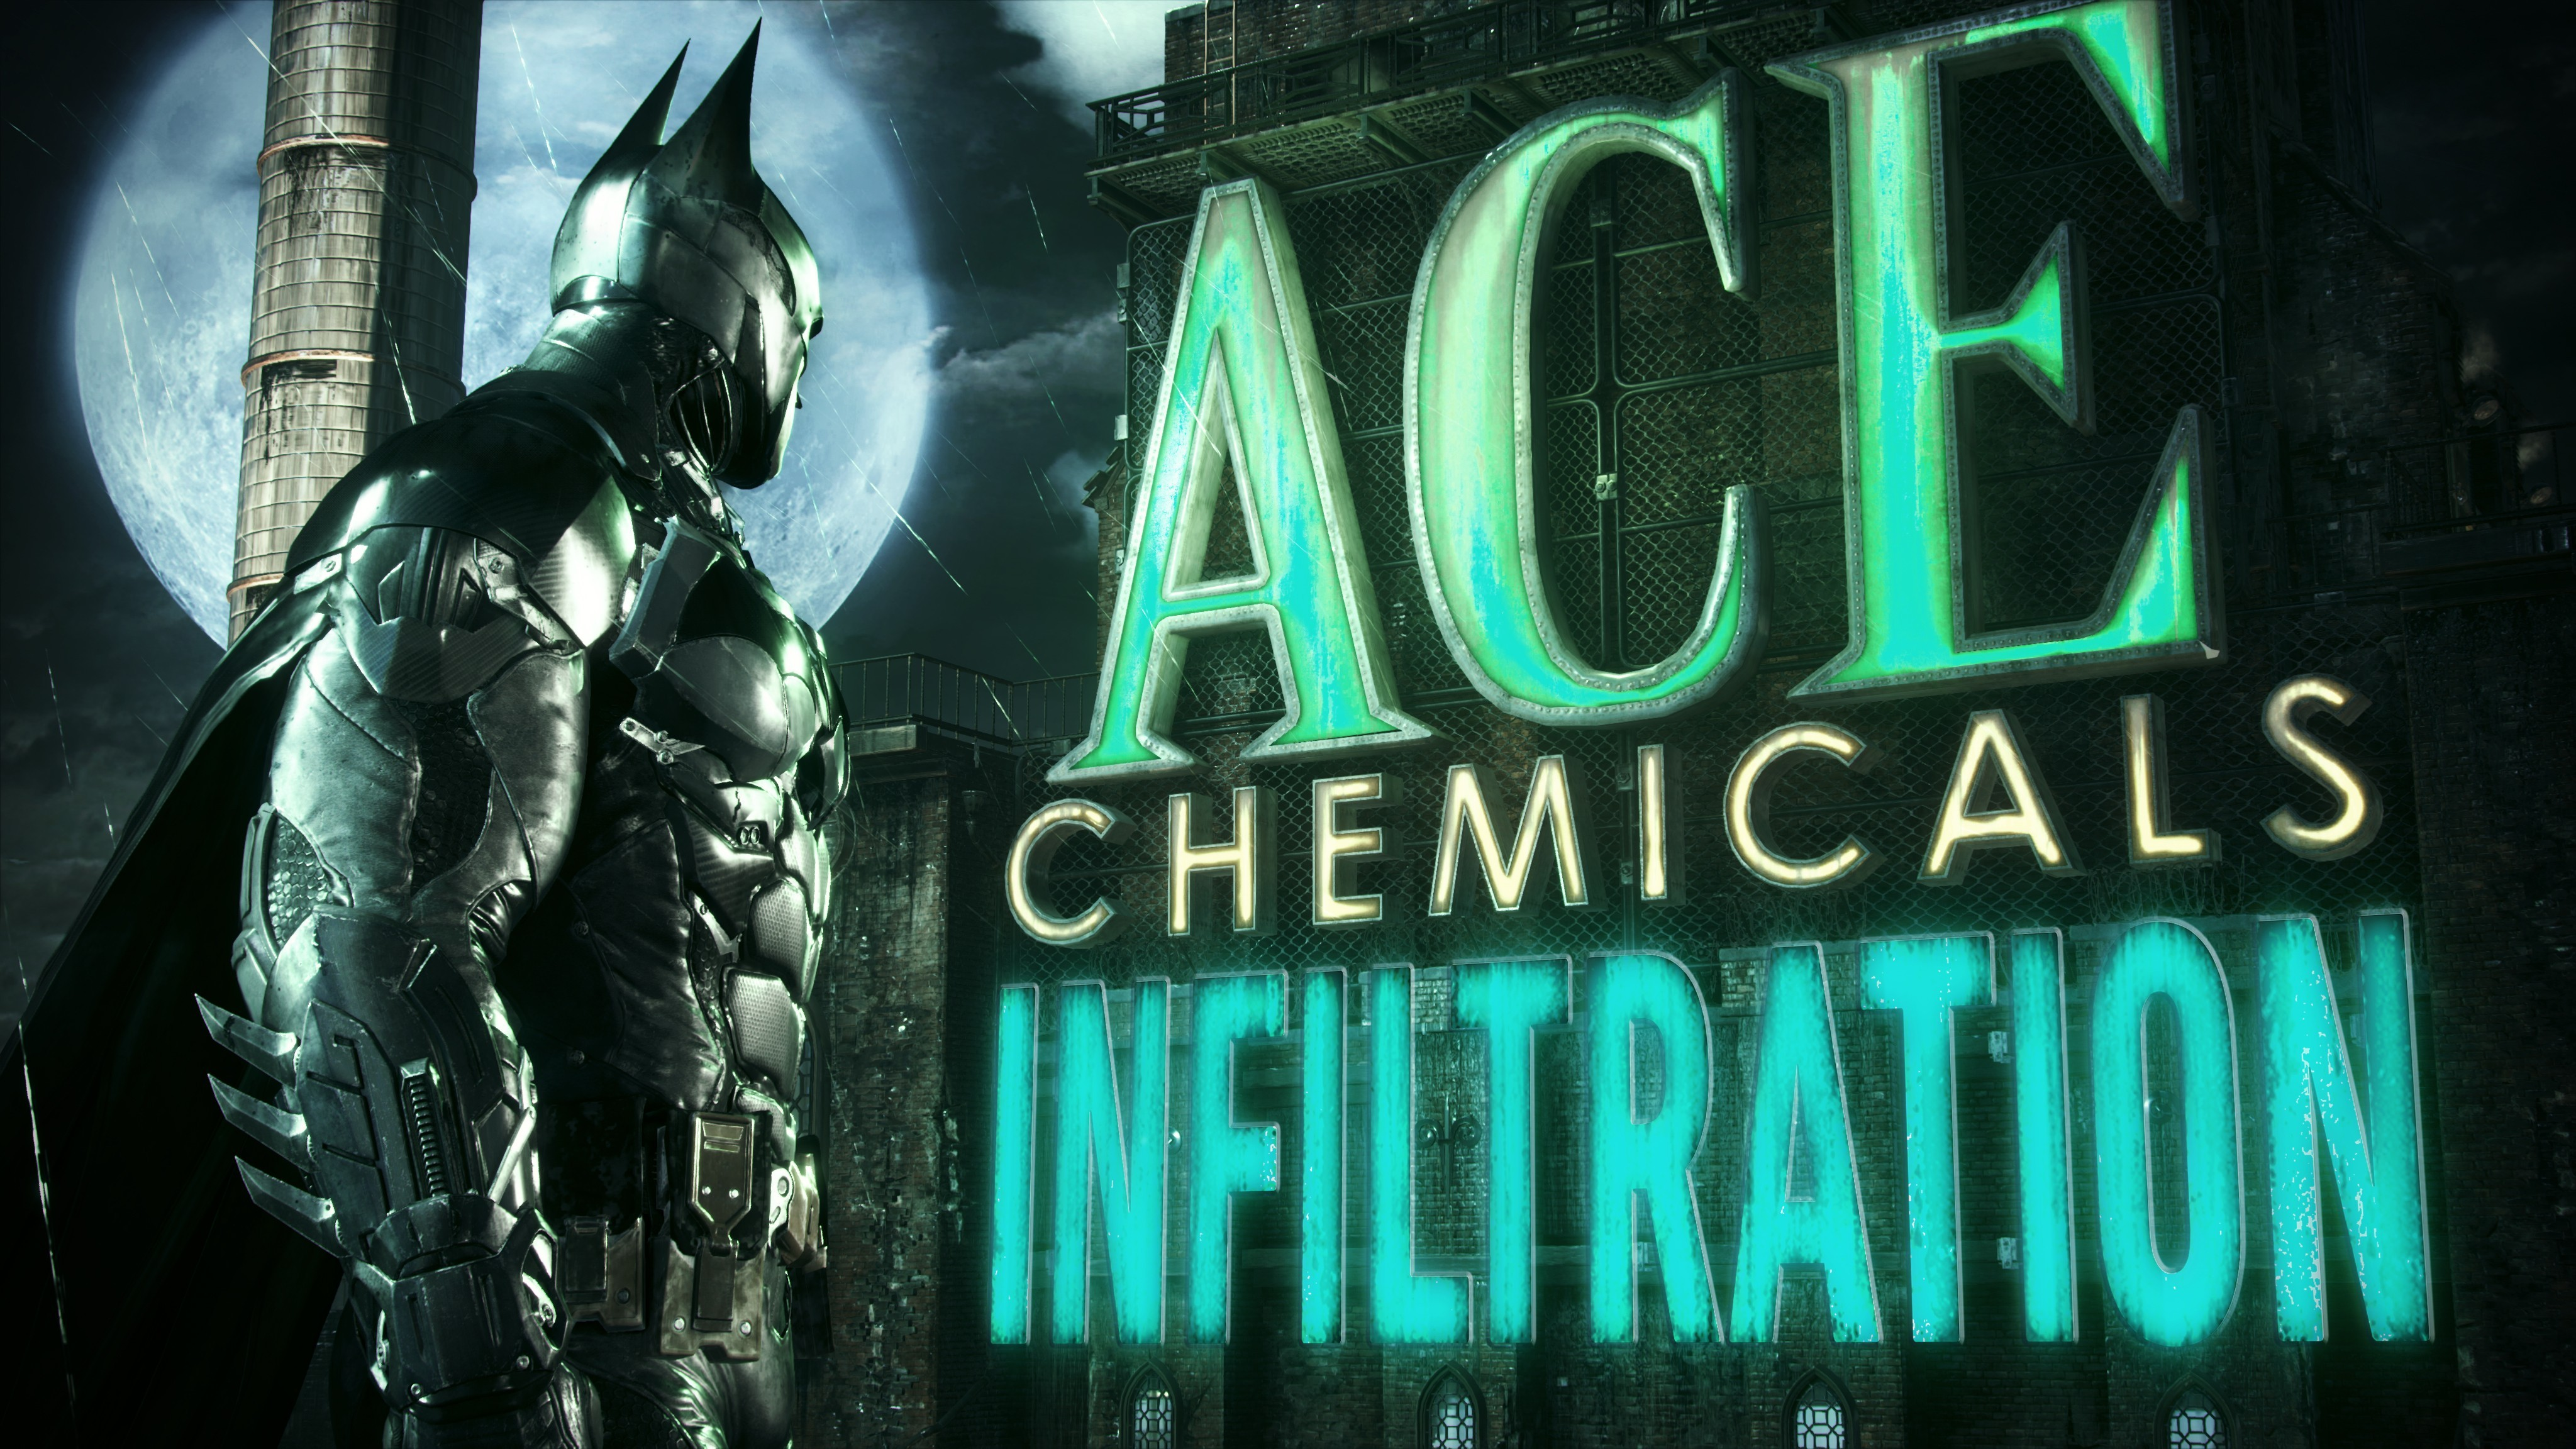 General 4096x2304 Batman Batman: Arkham Knight Gotham City video games